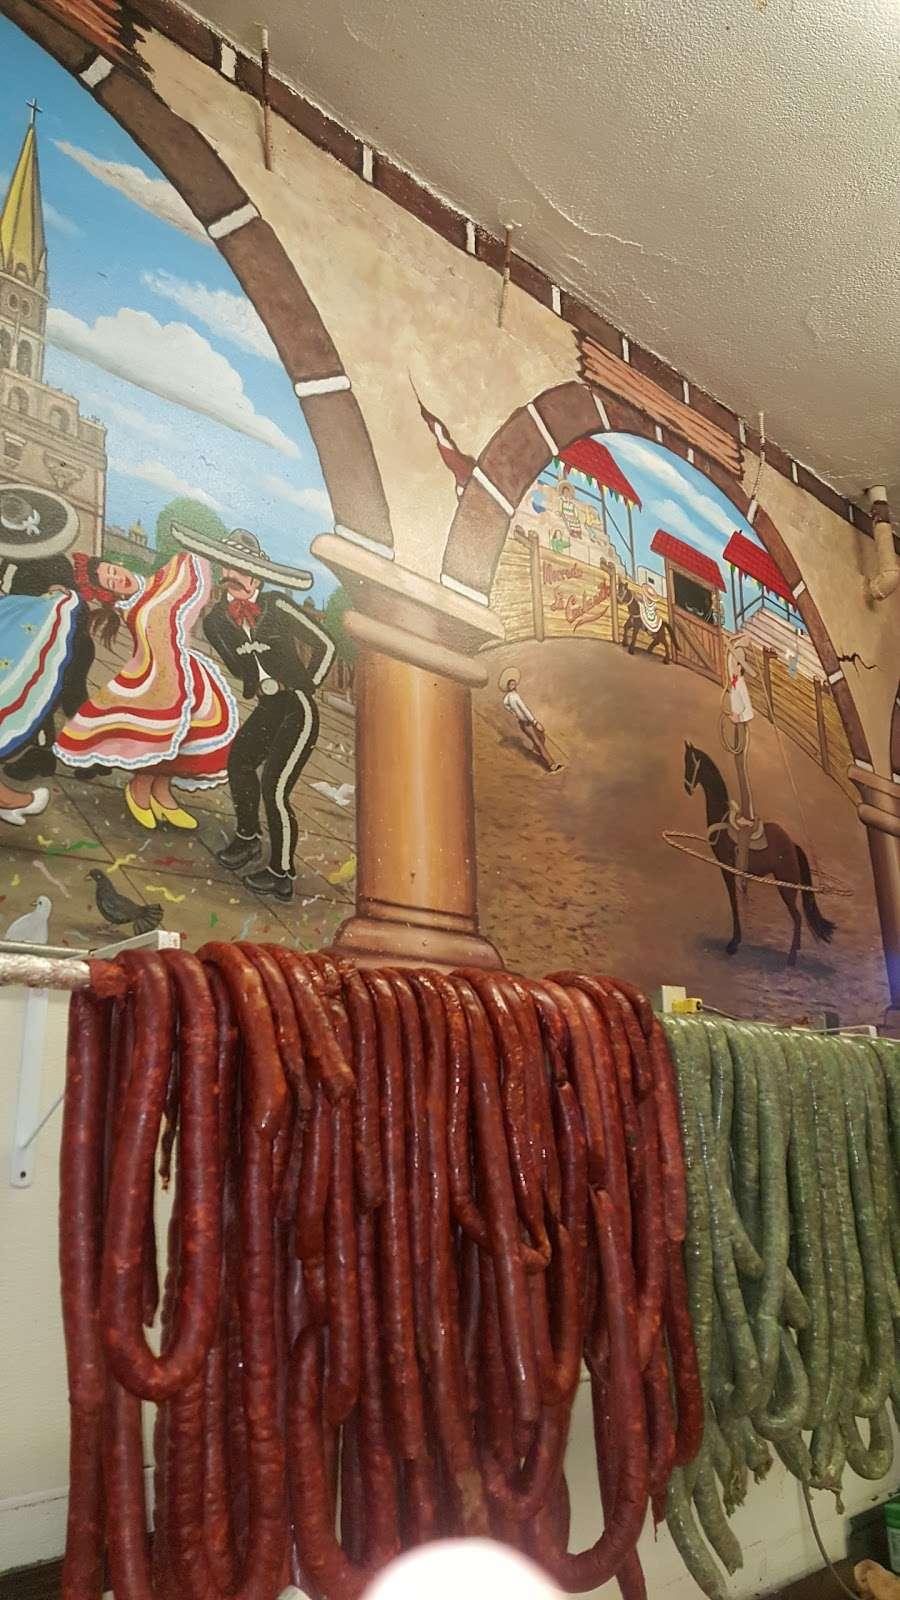 Mercado la Cachanilla #3 - store  | Photo 4 of 10 | Address: 345 N Azusa Ave, Azusa, CA 91702, USA | Phone: (626) 969-5800